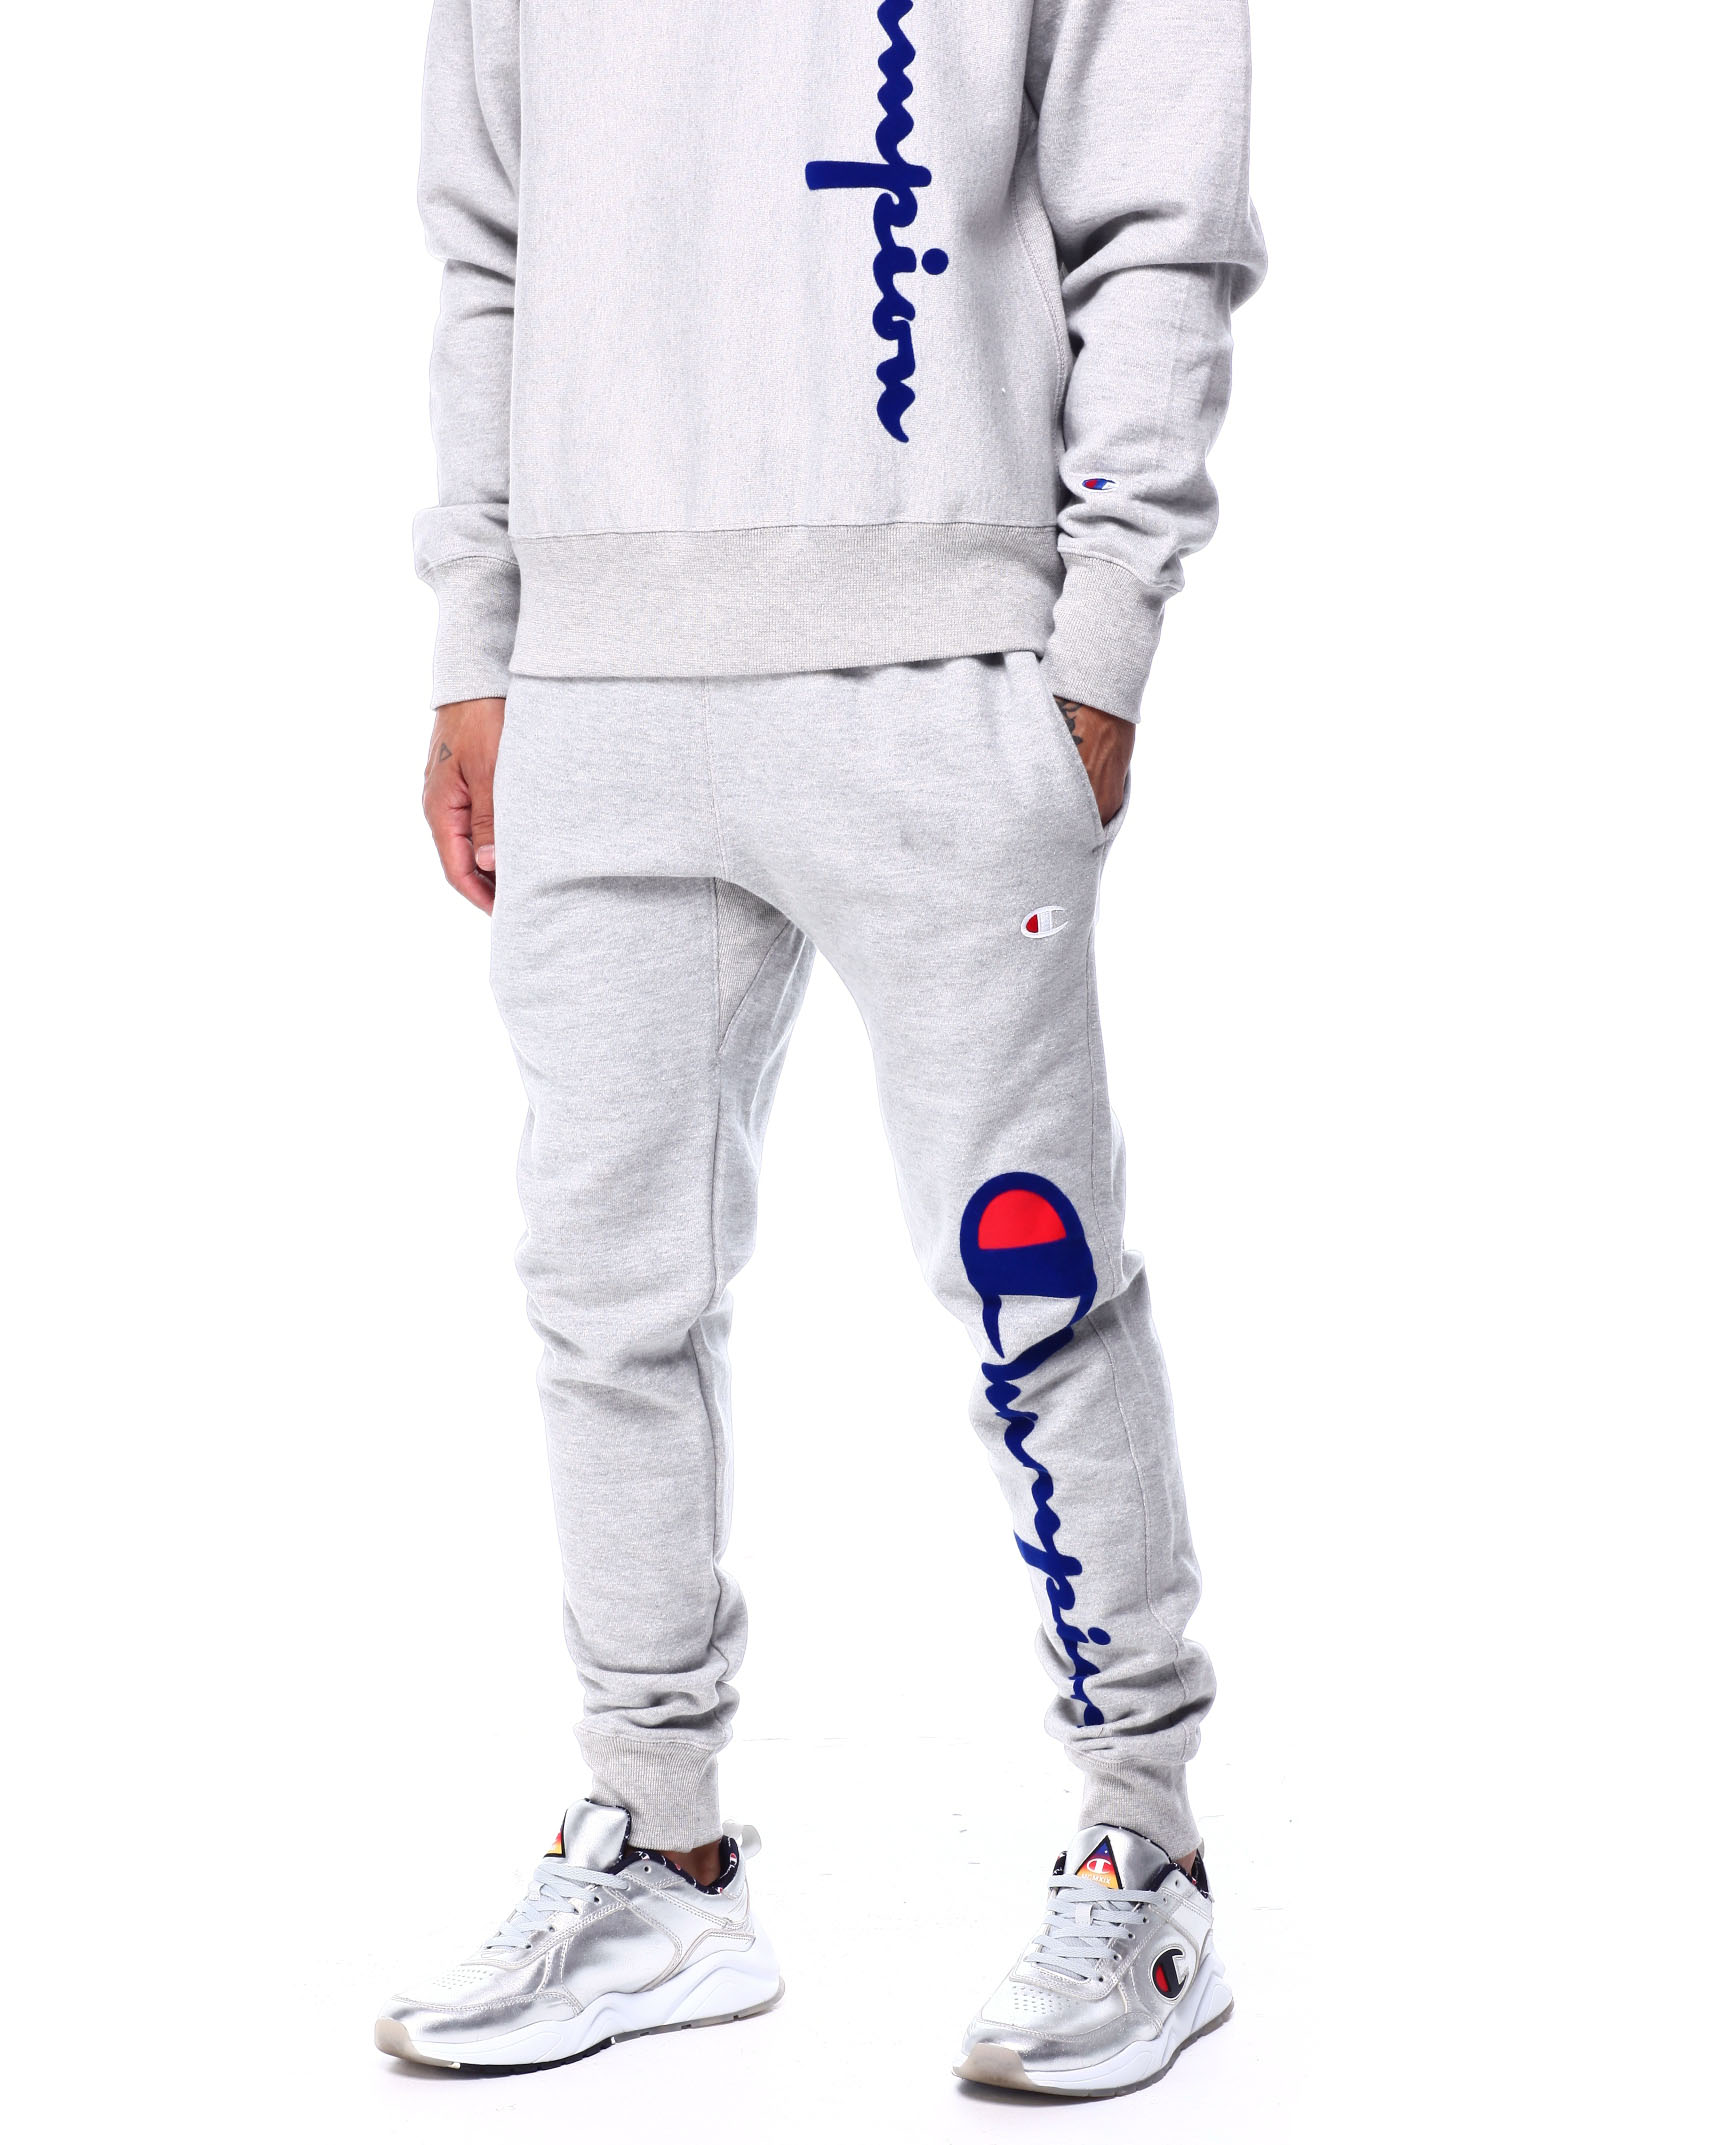 Buy OVERSIZED FLOCK JOGGER Men's Jeans & Pants from Champion